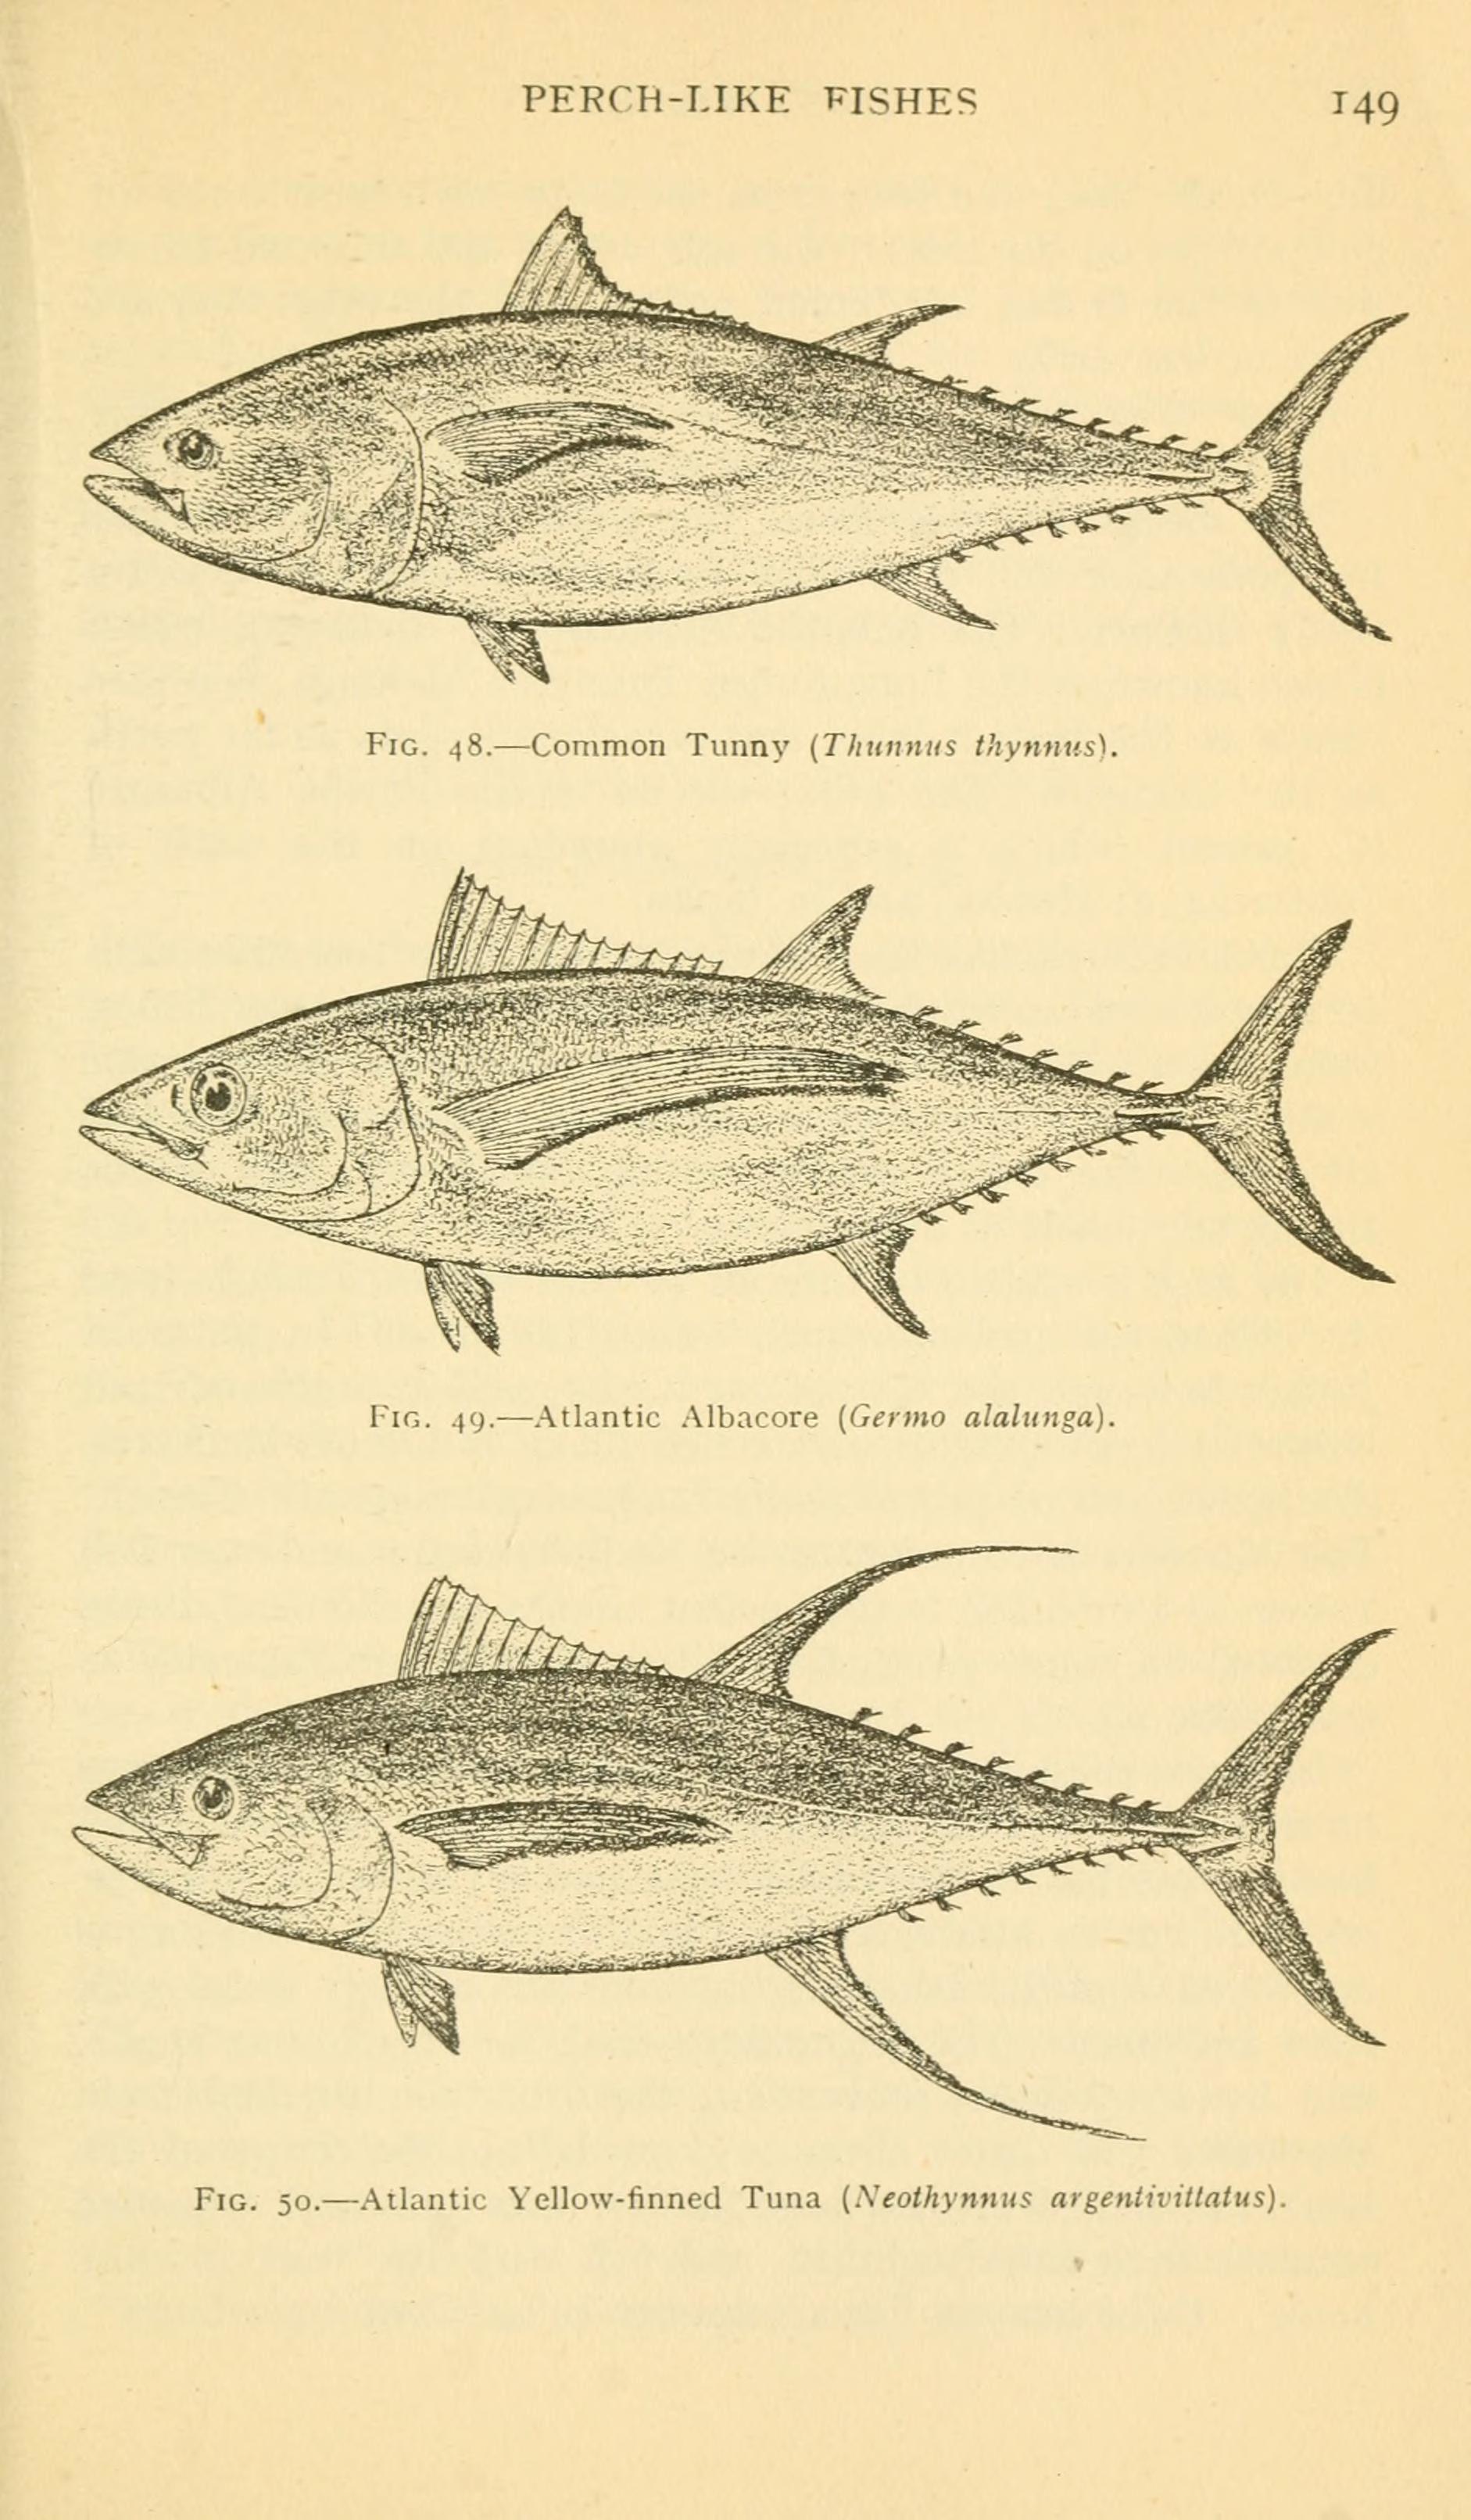 Image of Atlantic Bluefin Tuna